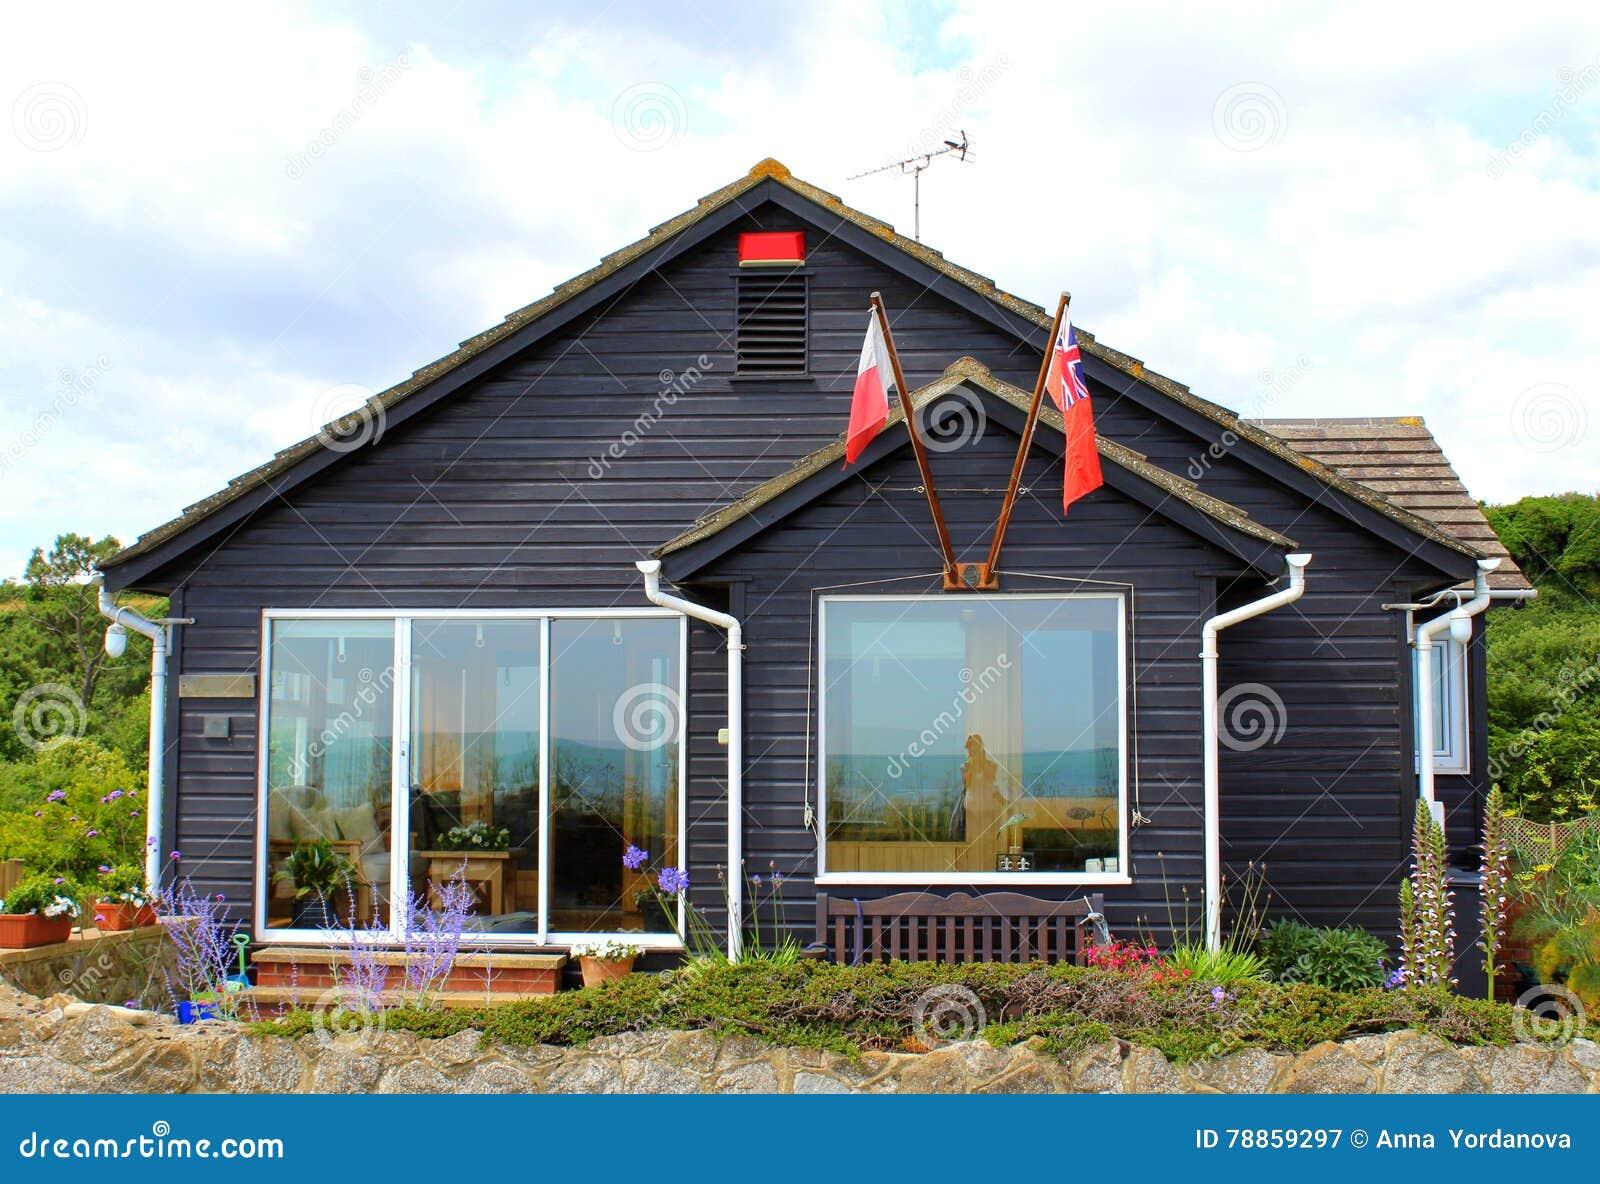 english country vacation bungalow kent england stock image image